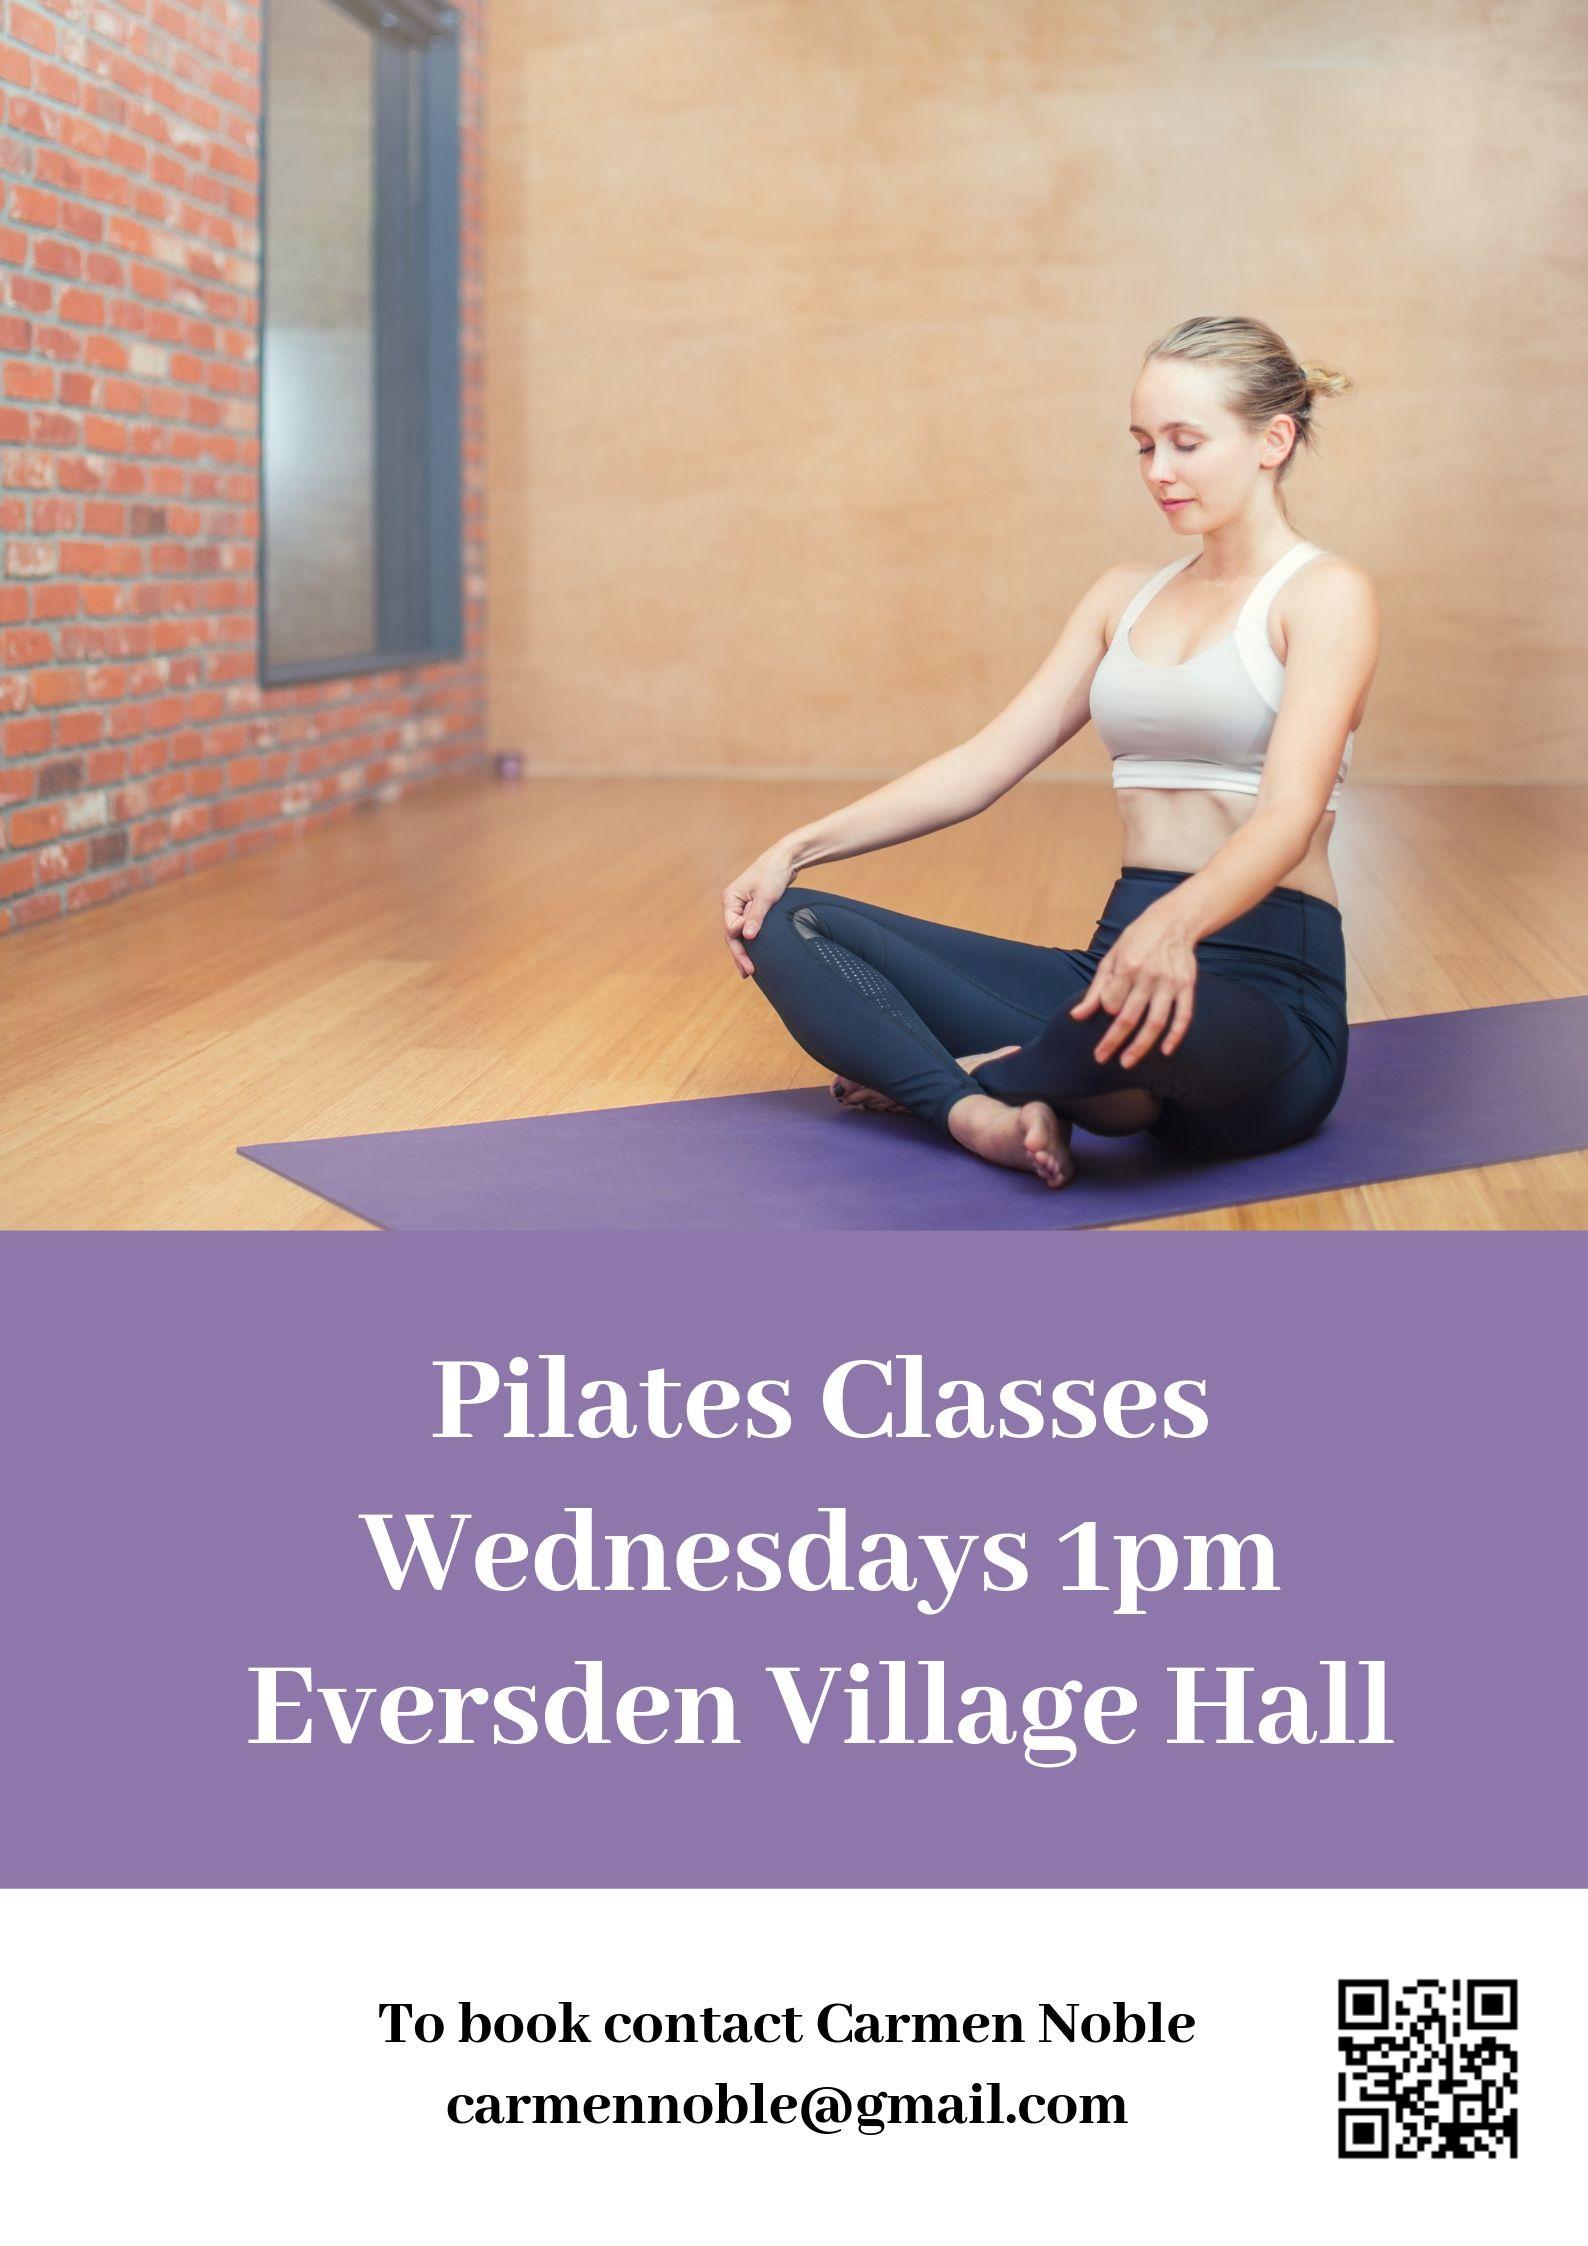 Pilates Wednesdays 1pm